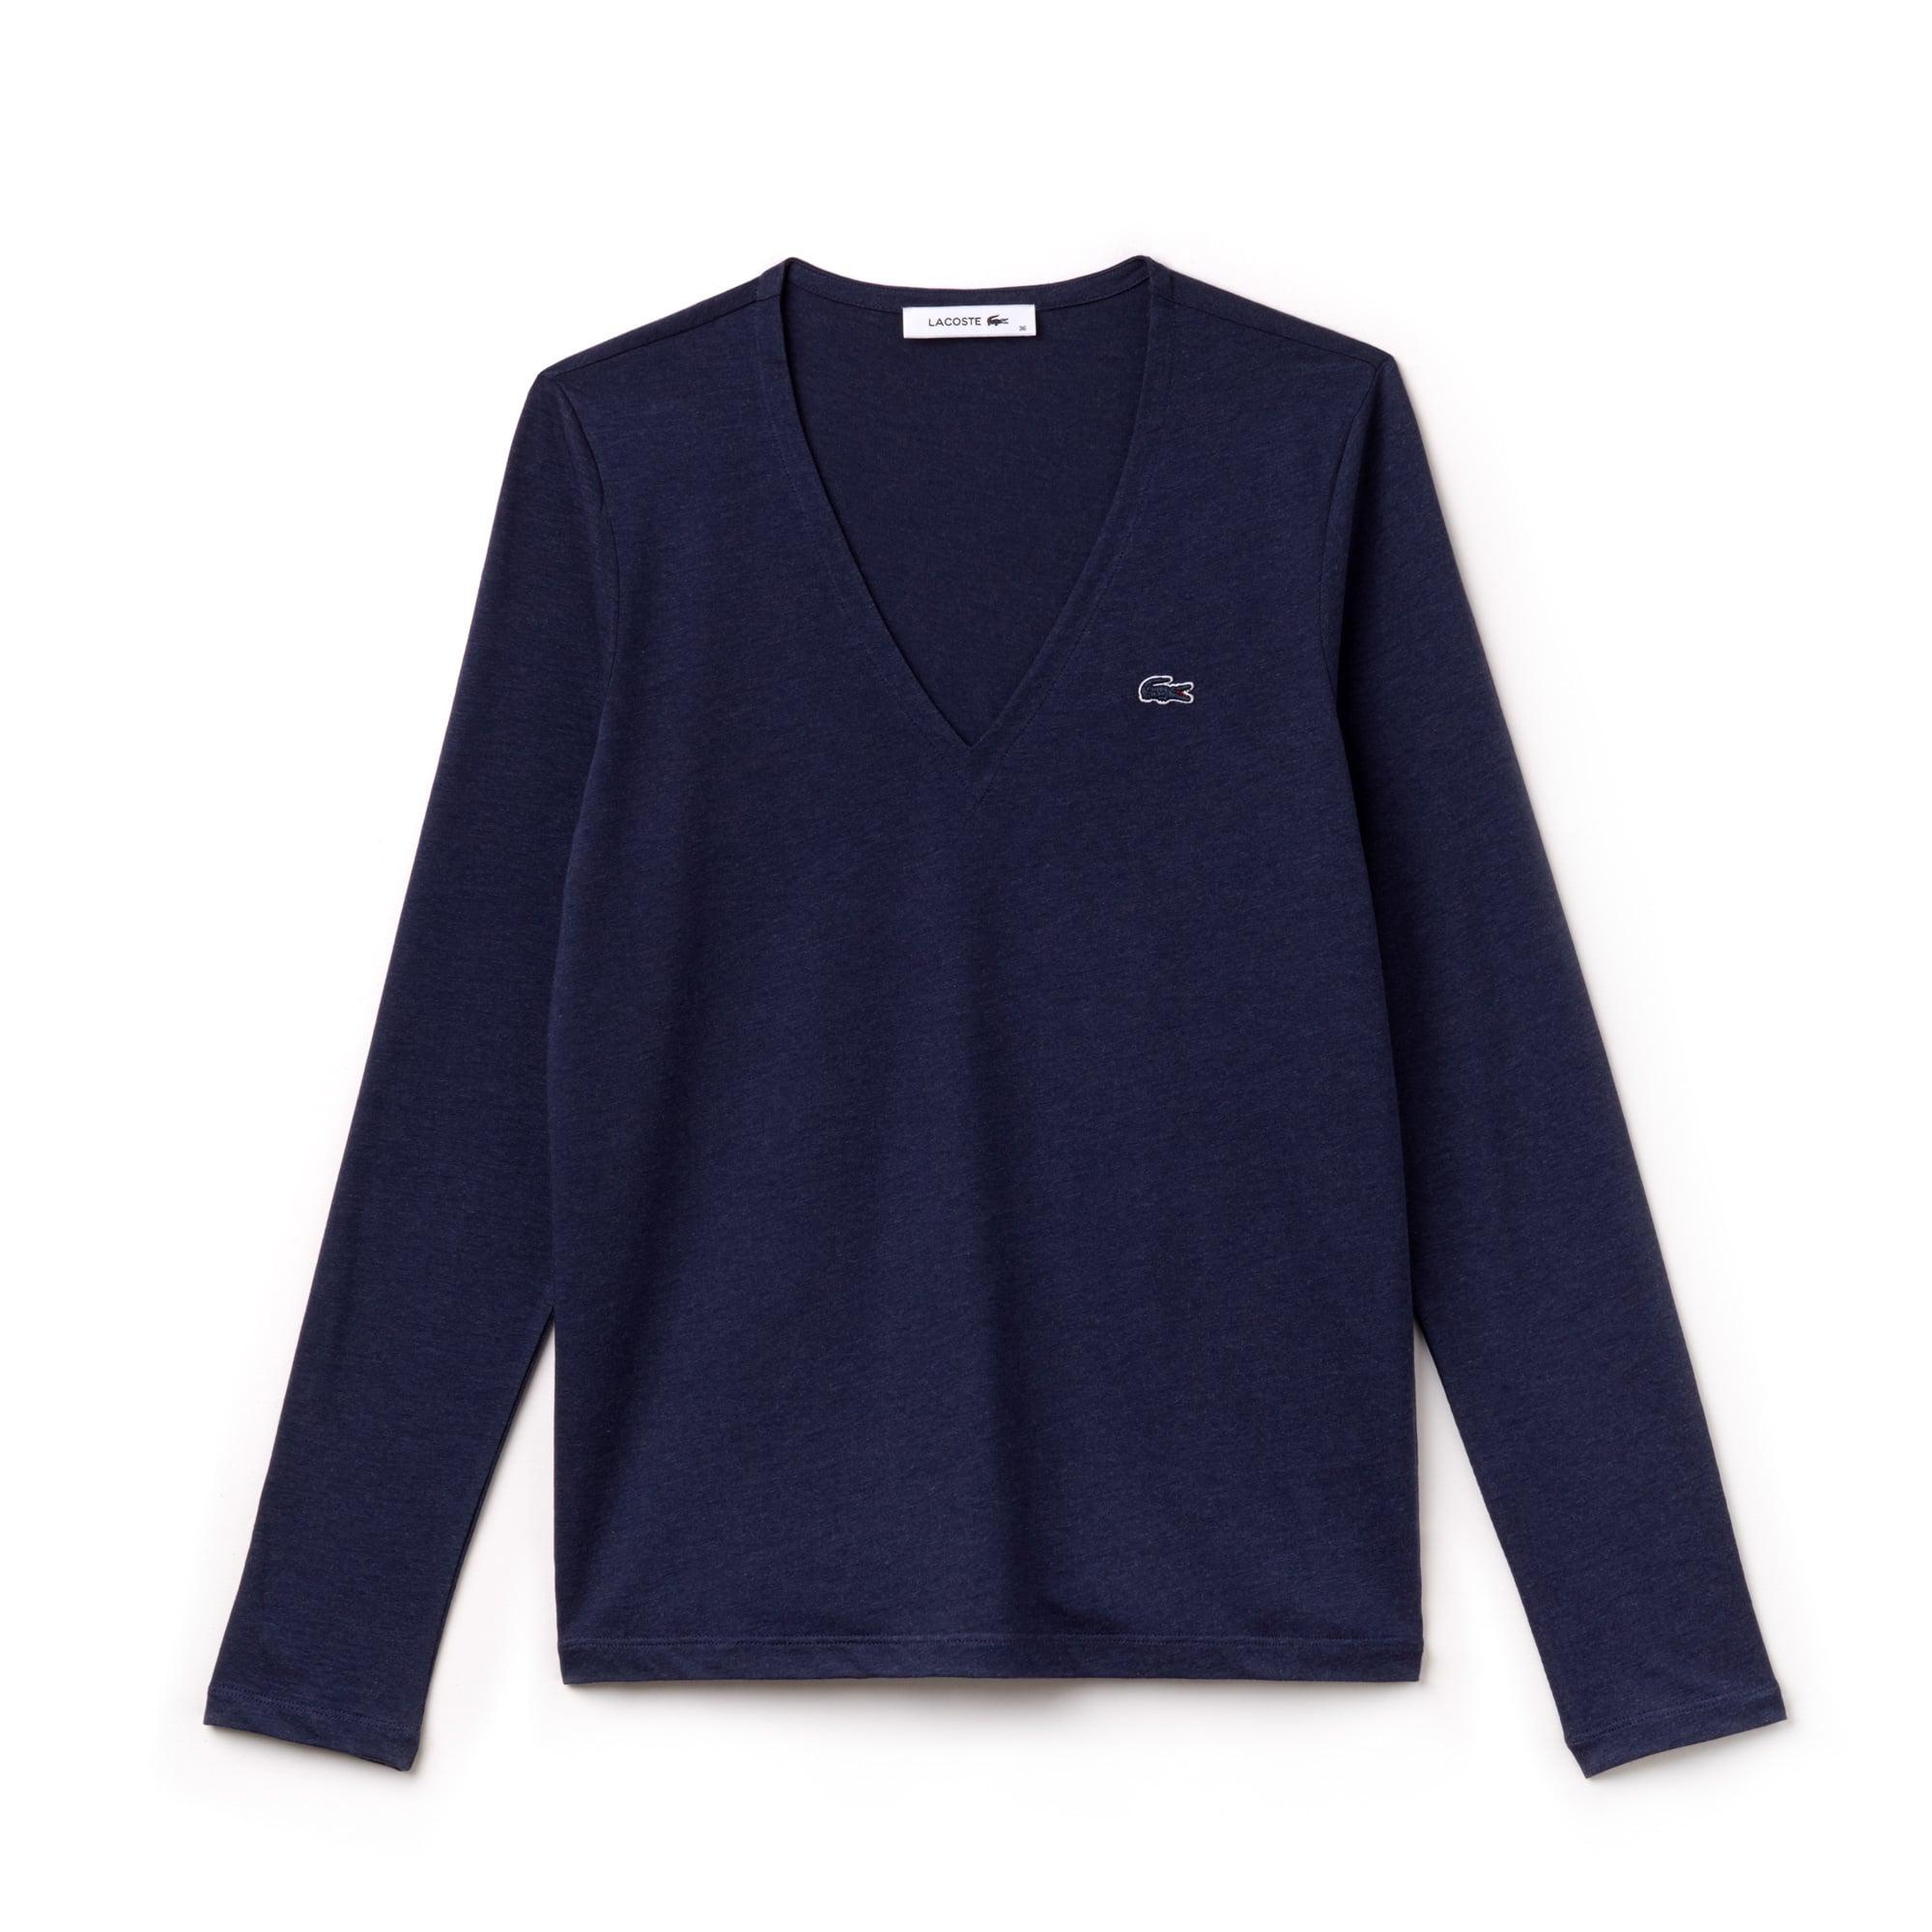 Women's V-neck Flowing Cotton Jersey T-shirt